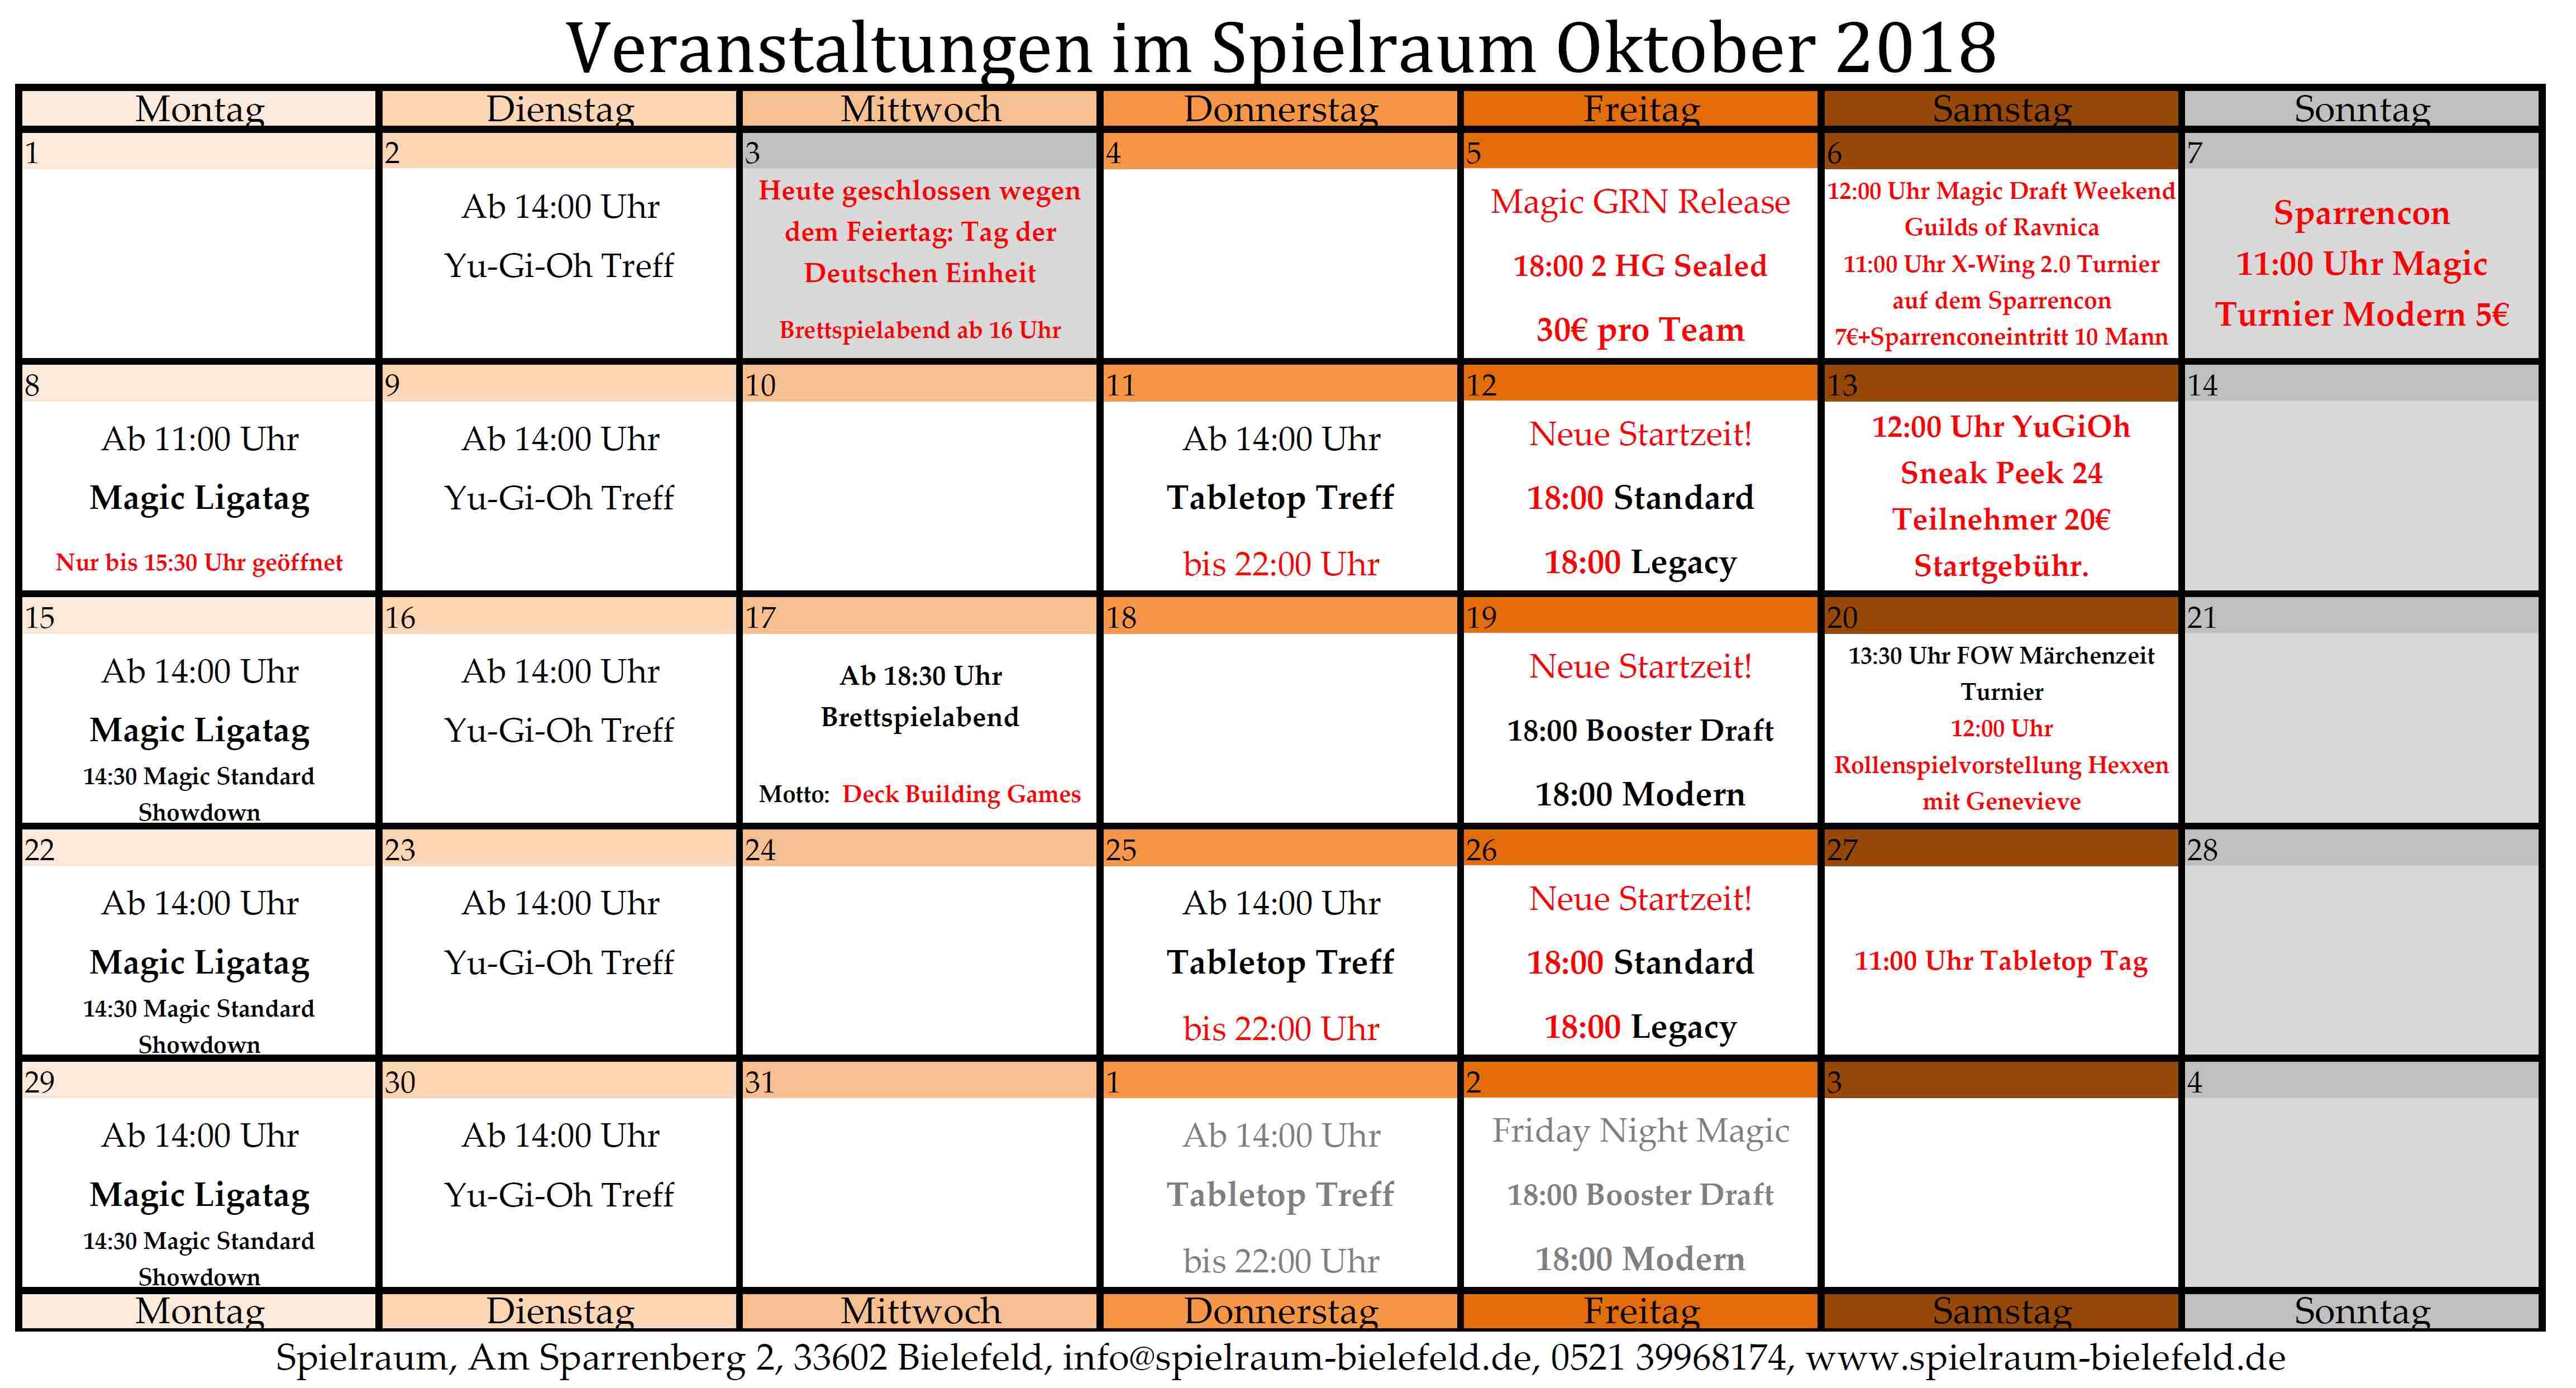 Monatsplan Oktober 2018